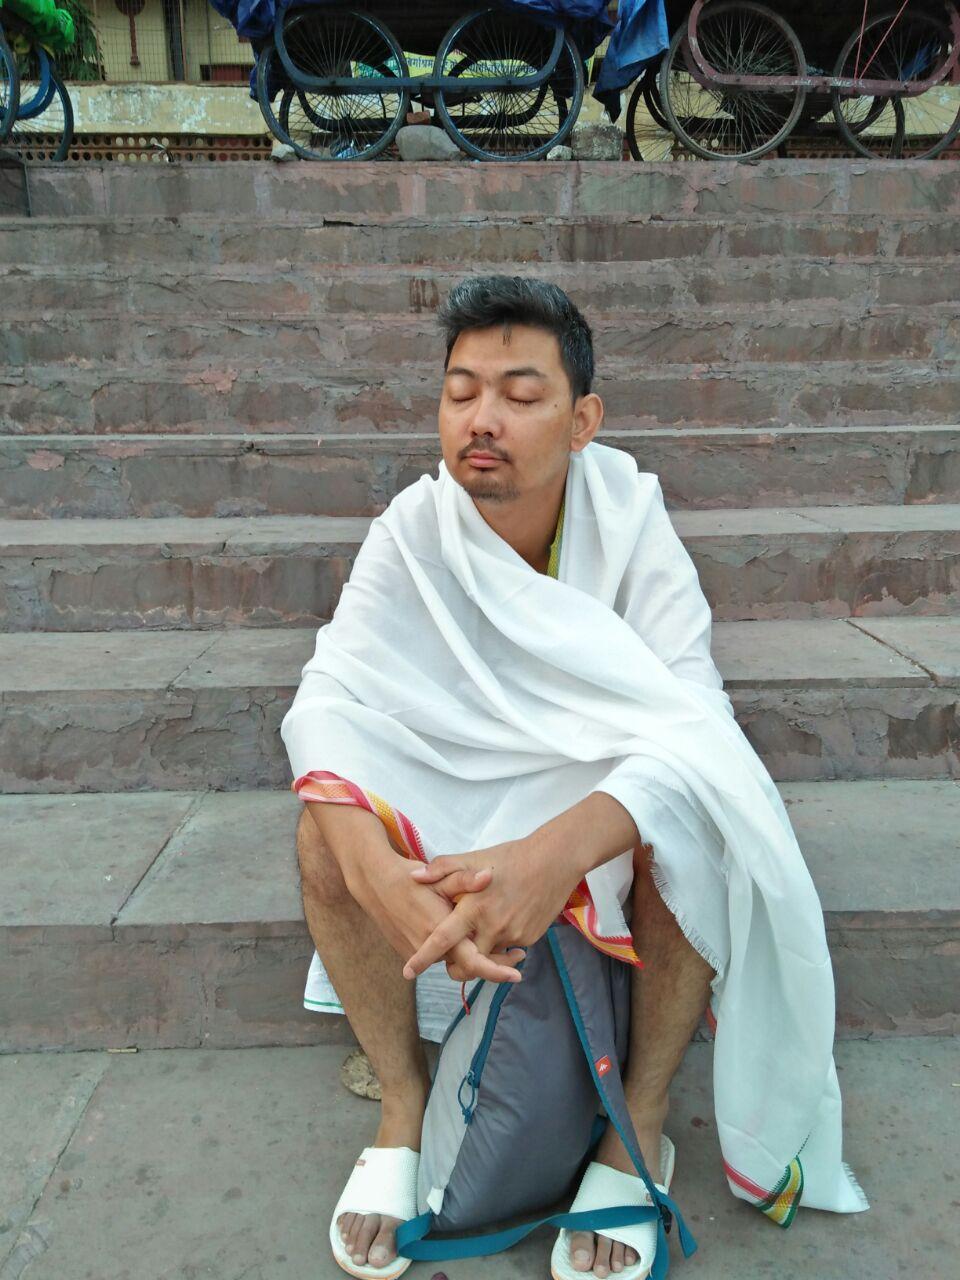 My companion at Rishikesh